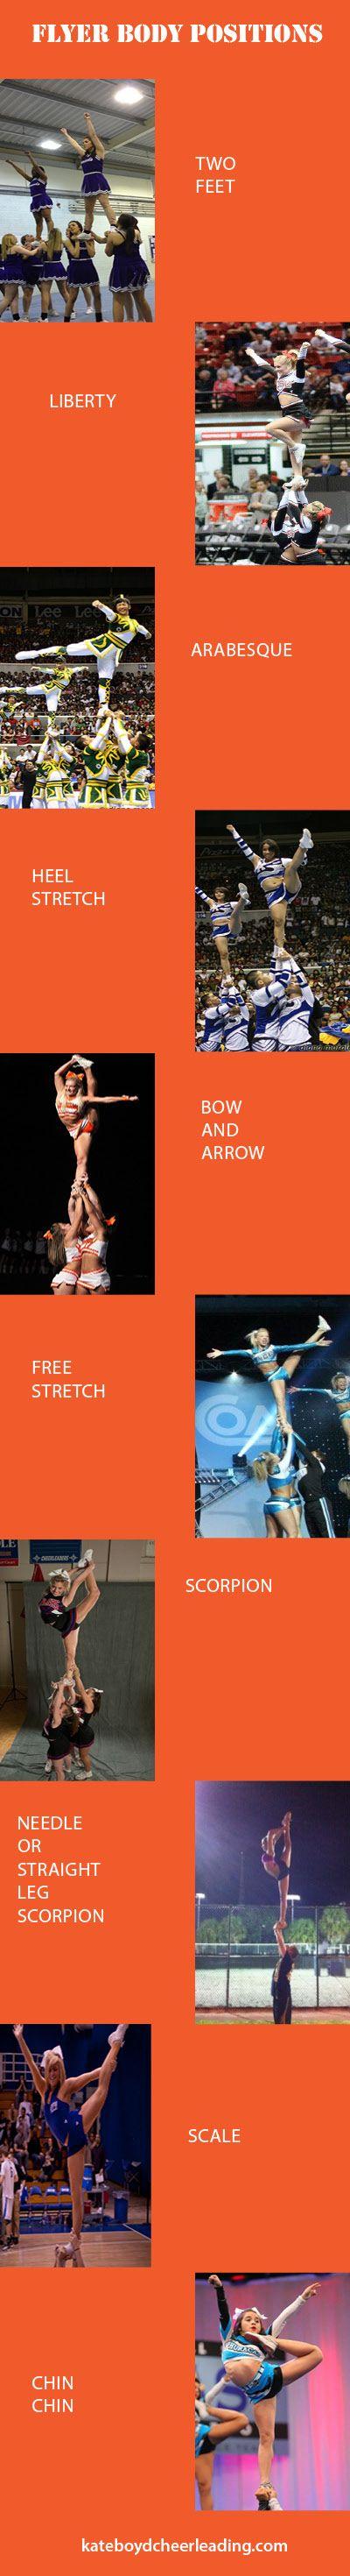 Flyer body positions - Kate Boyd Cheerleading